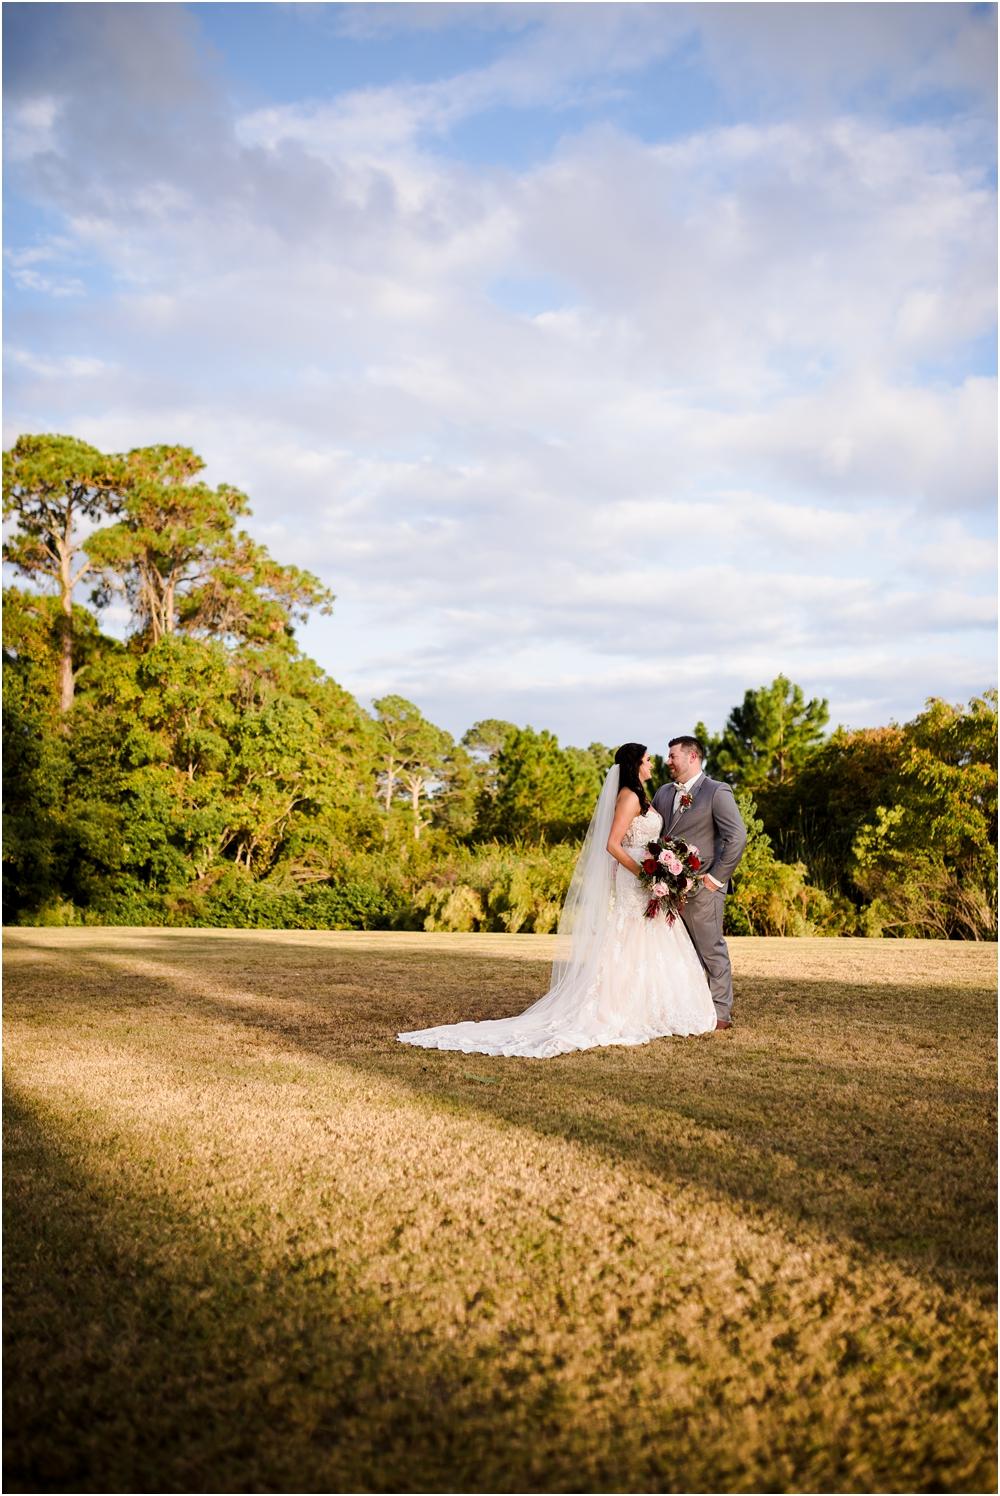 imhof-sheraton-panama-city-beach-florida-wedding-photographer-kiersten-grant-103.jpg